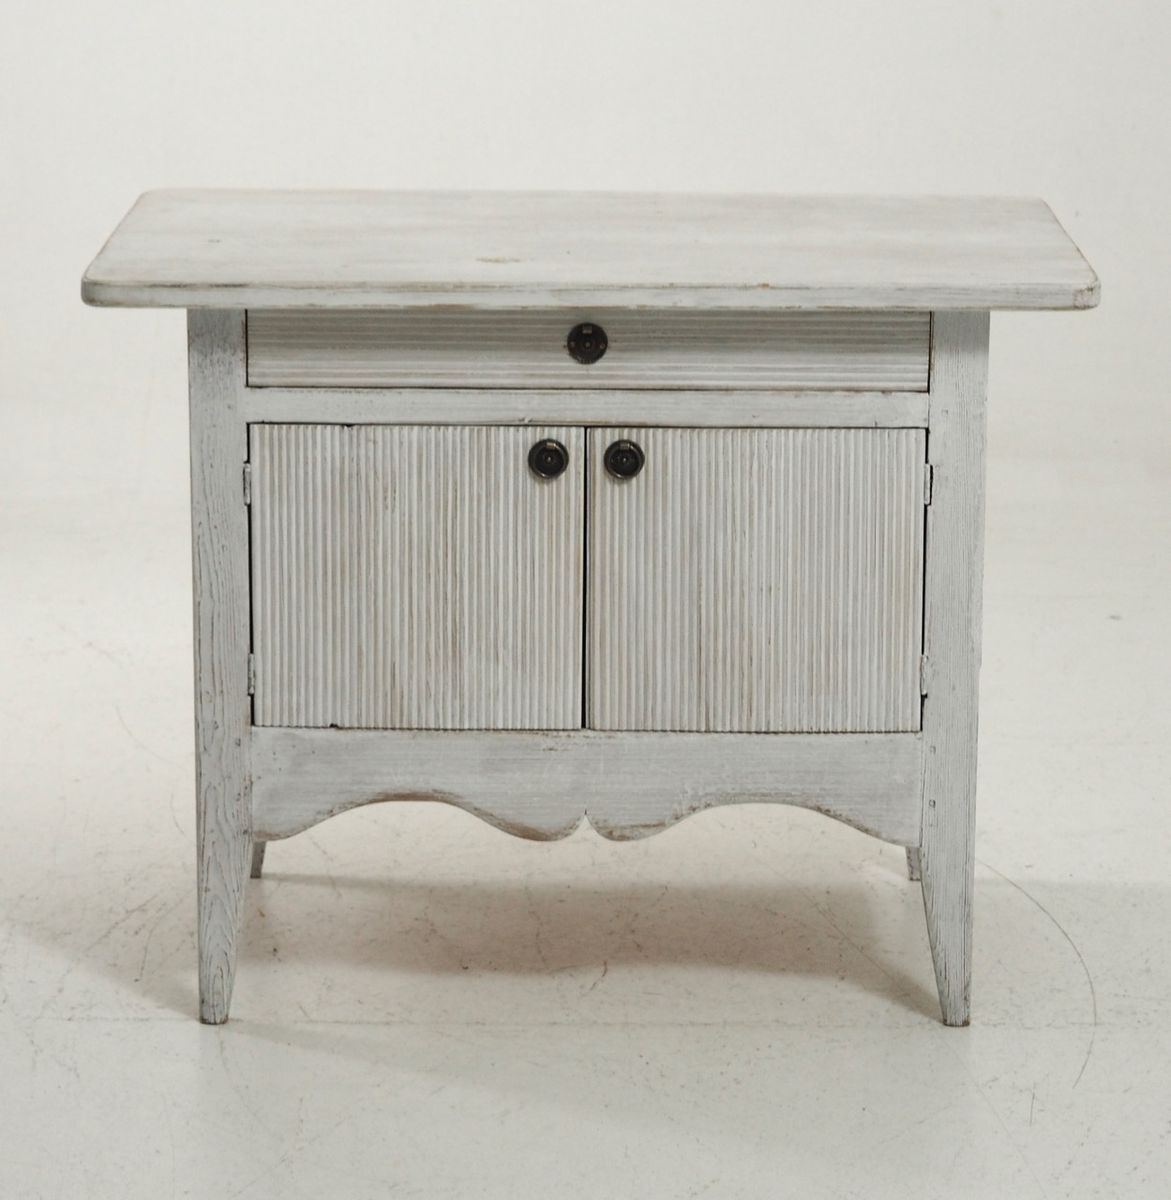 geschwungener geschnitzter antiker schrank bei pamono kaufen. Black Bedroom Furniture Sets. Home Design Ideas